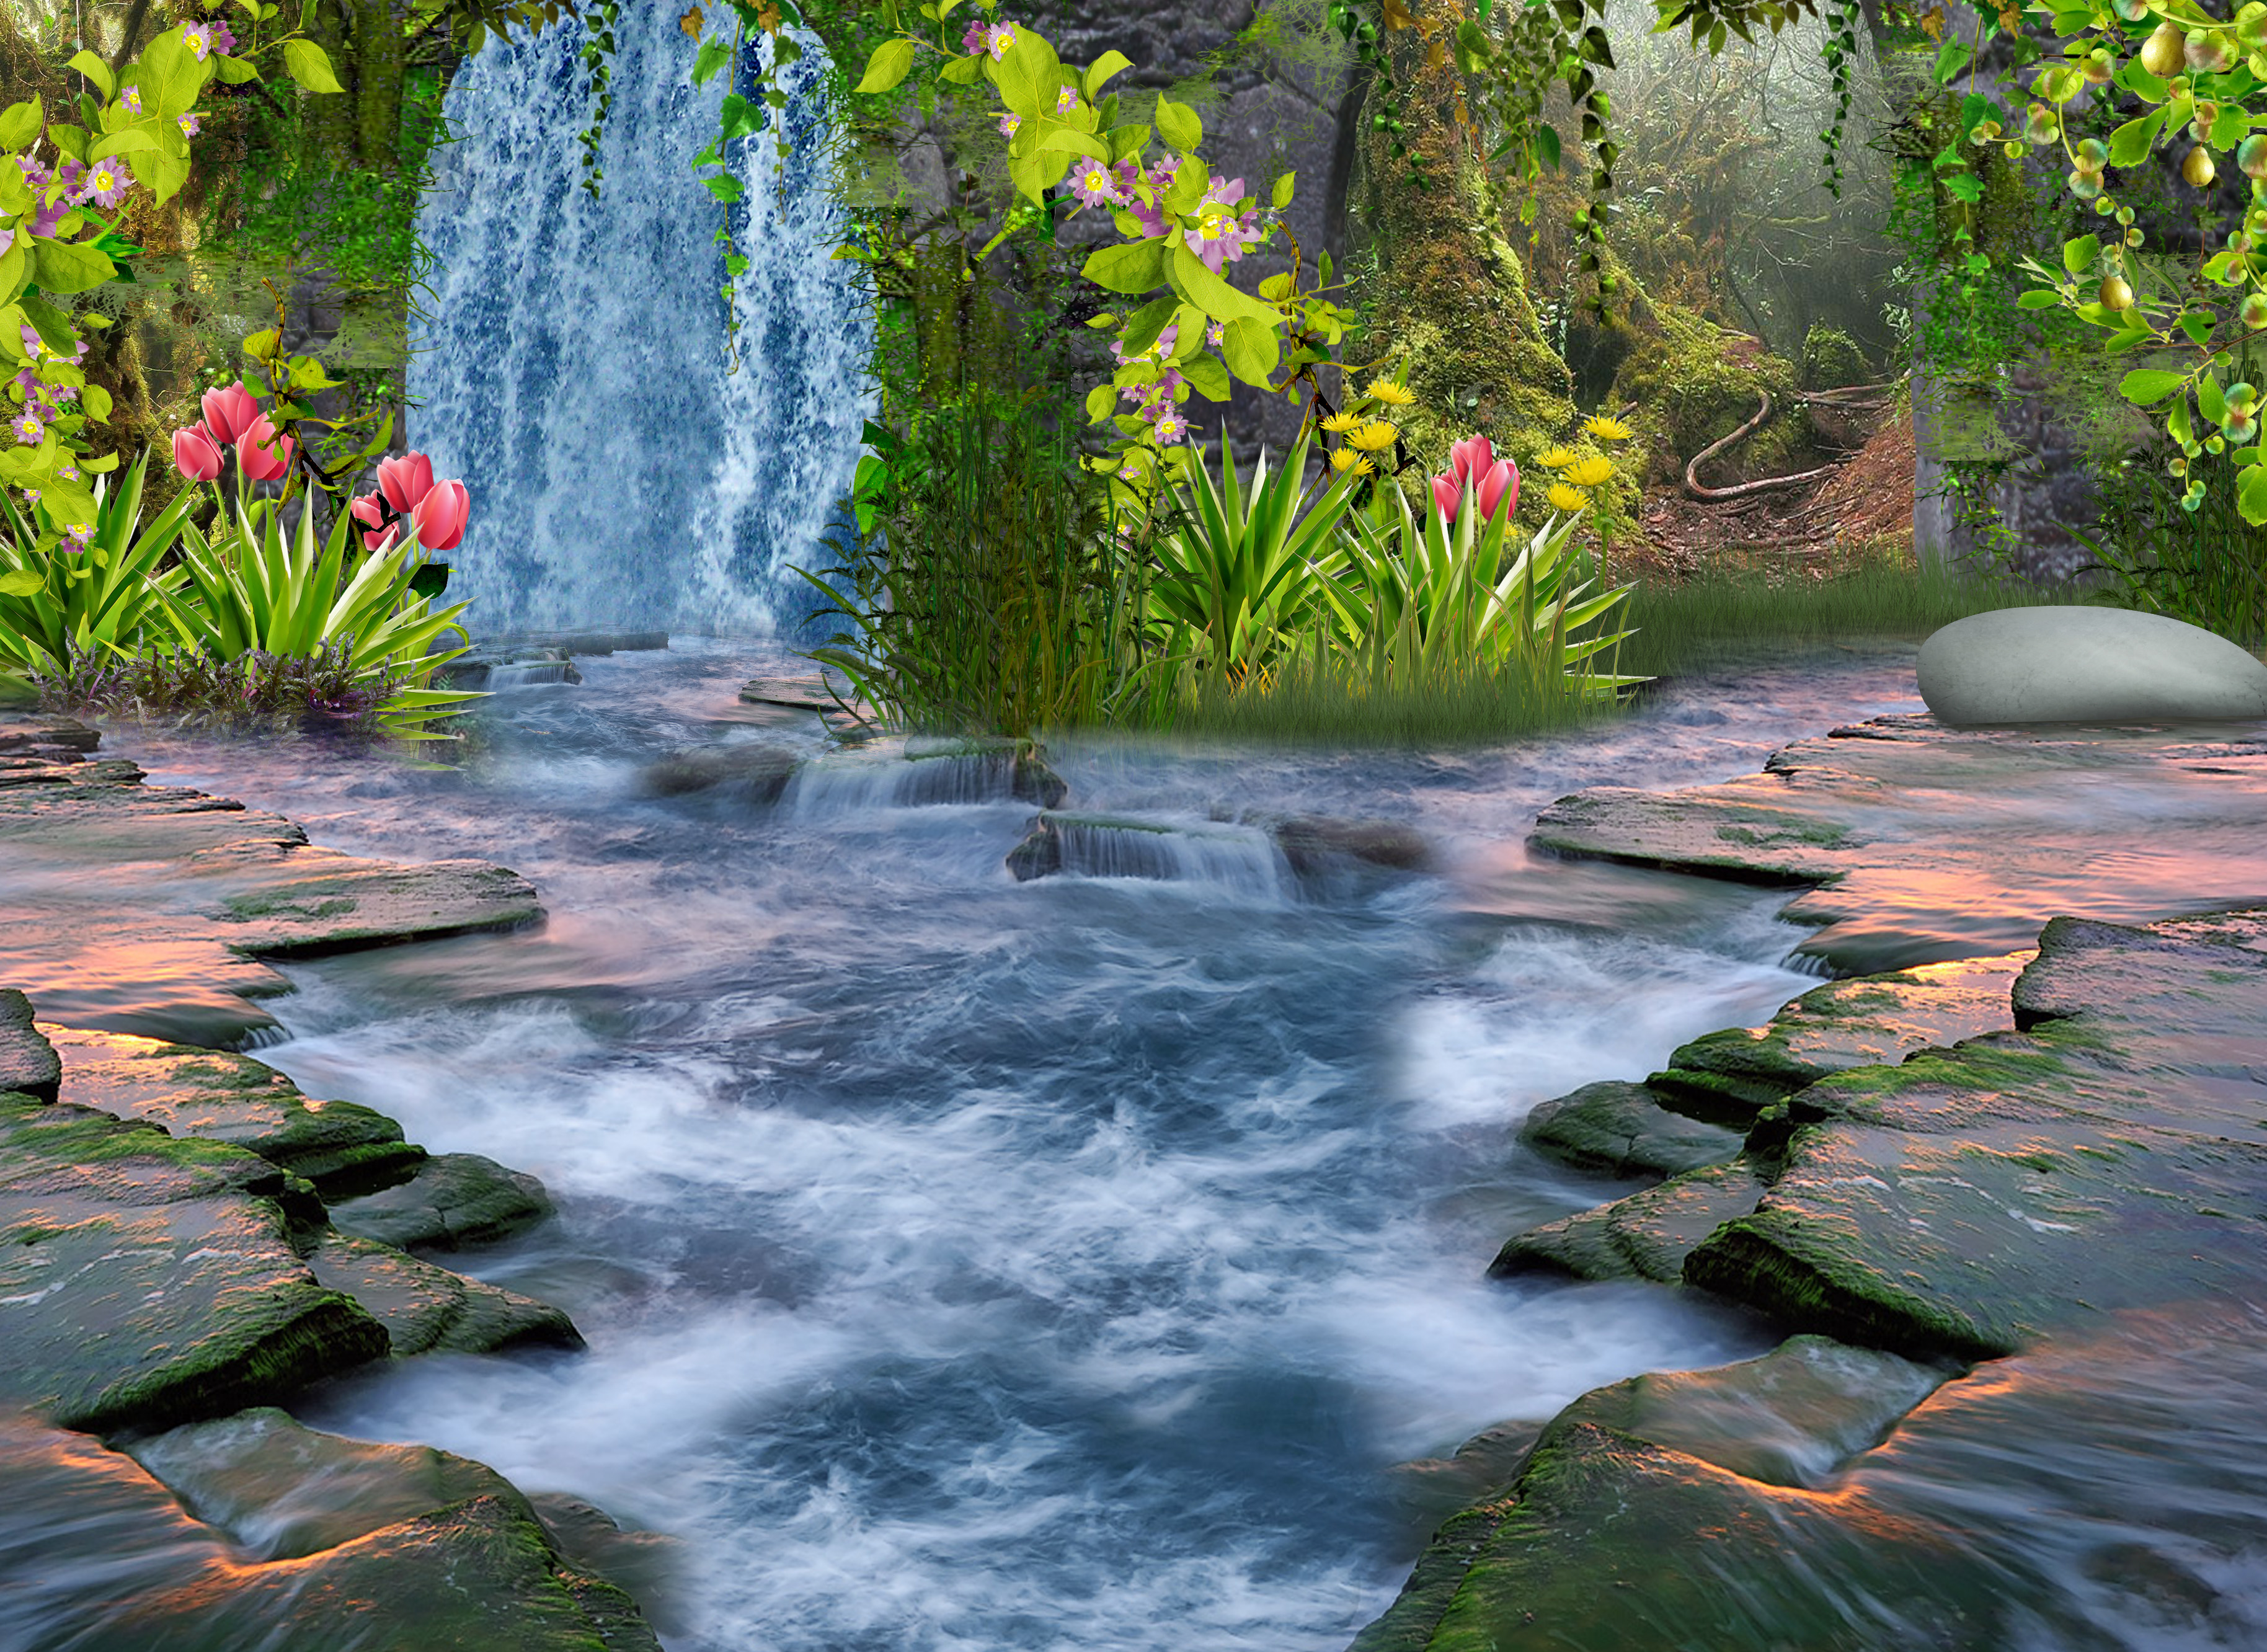 Fantasy forest stream hd wallpaper background image for Immagini natura gratis